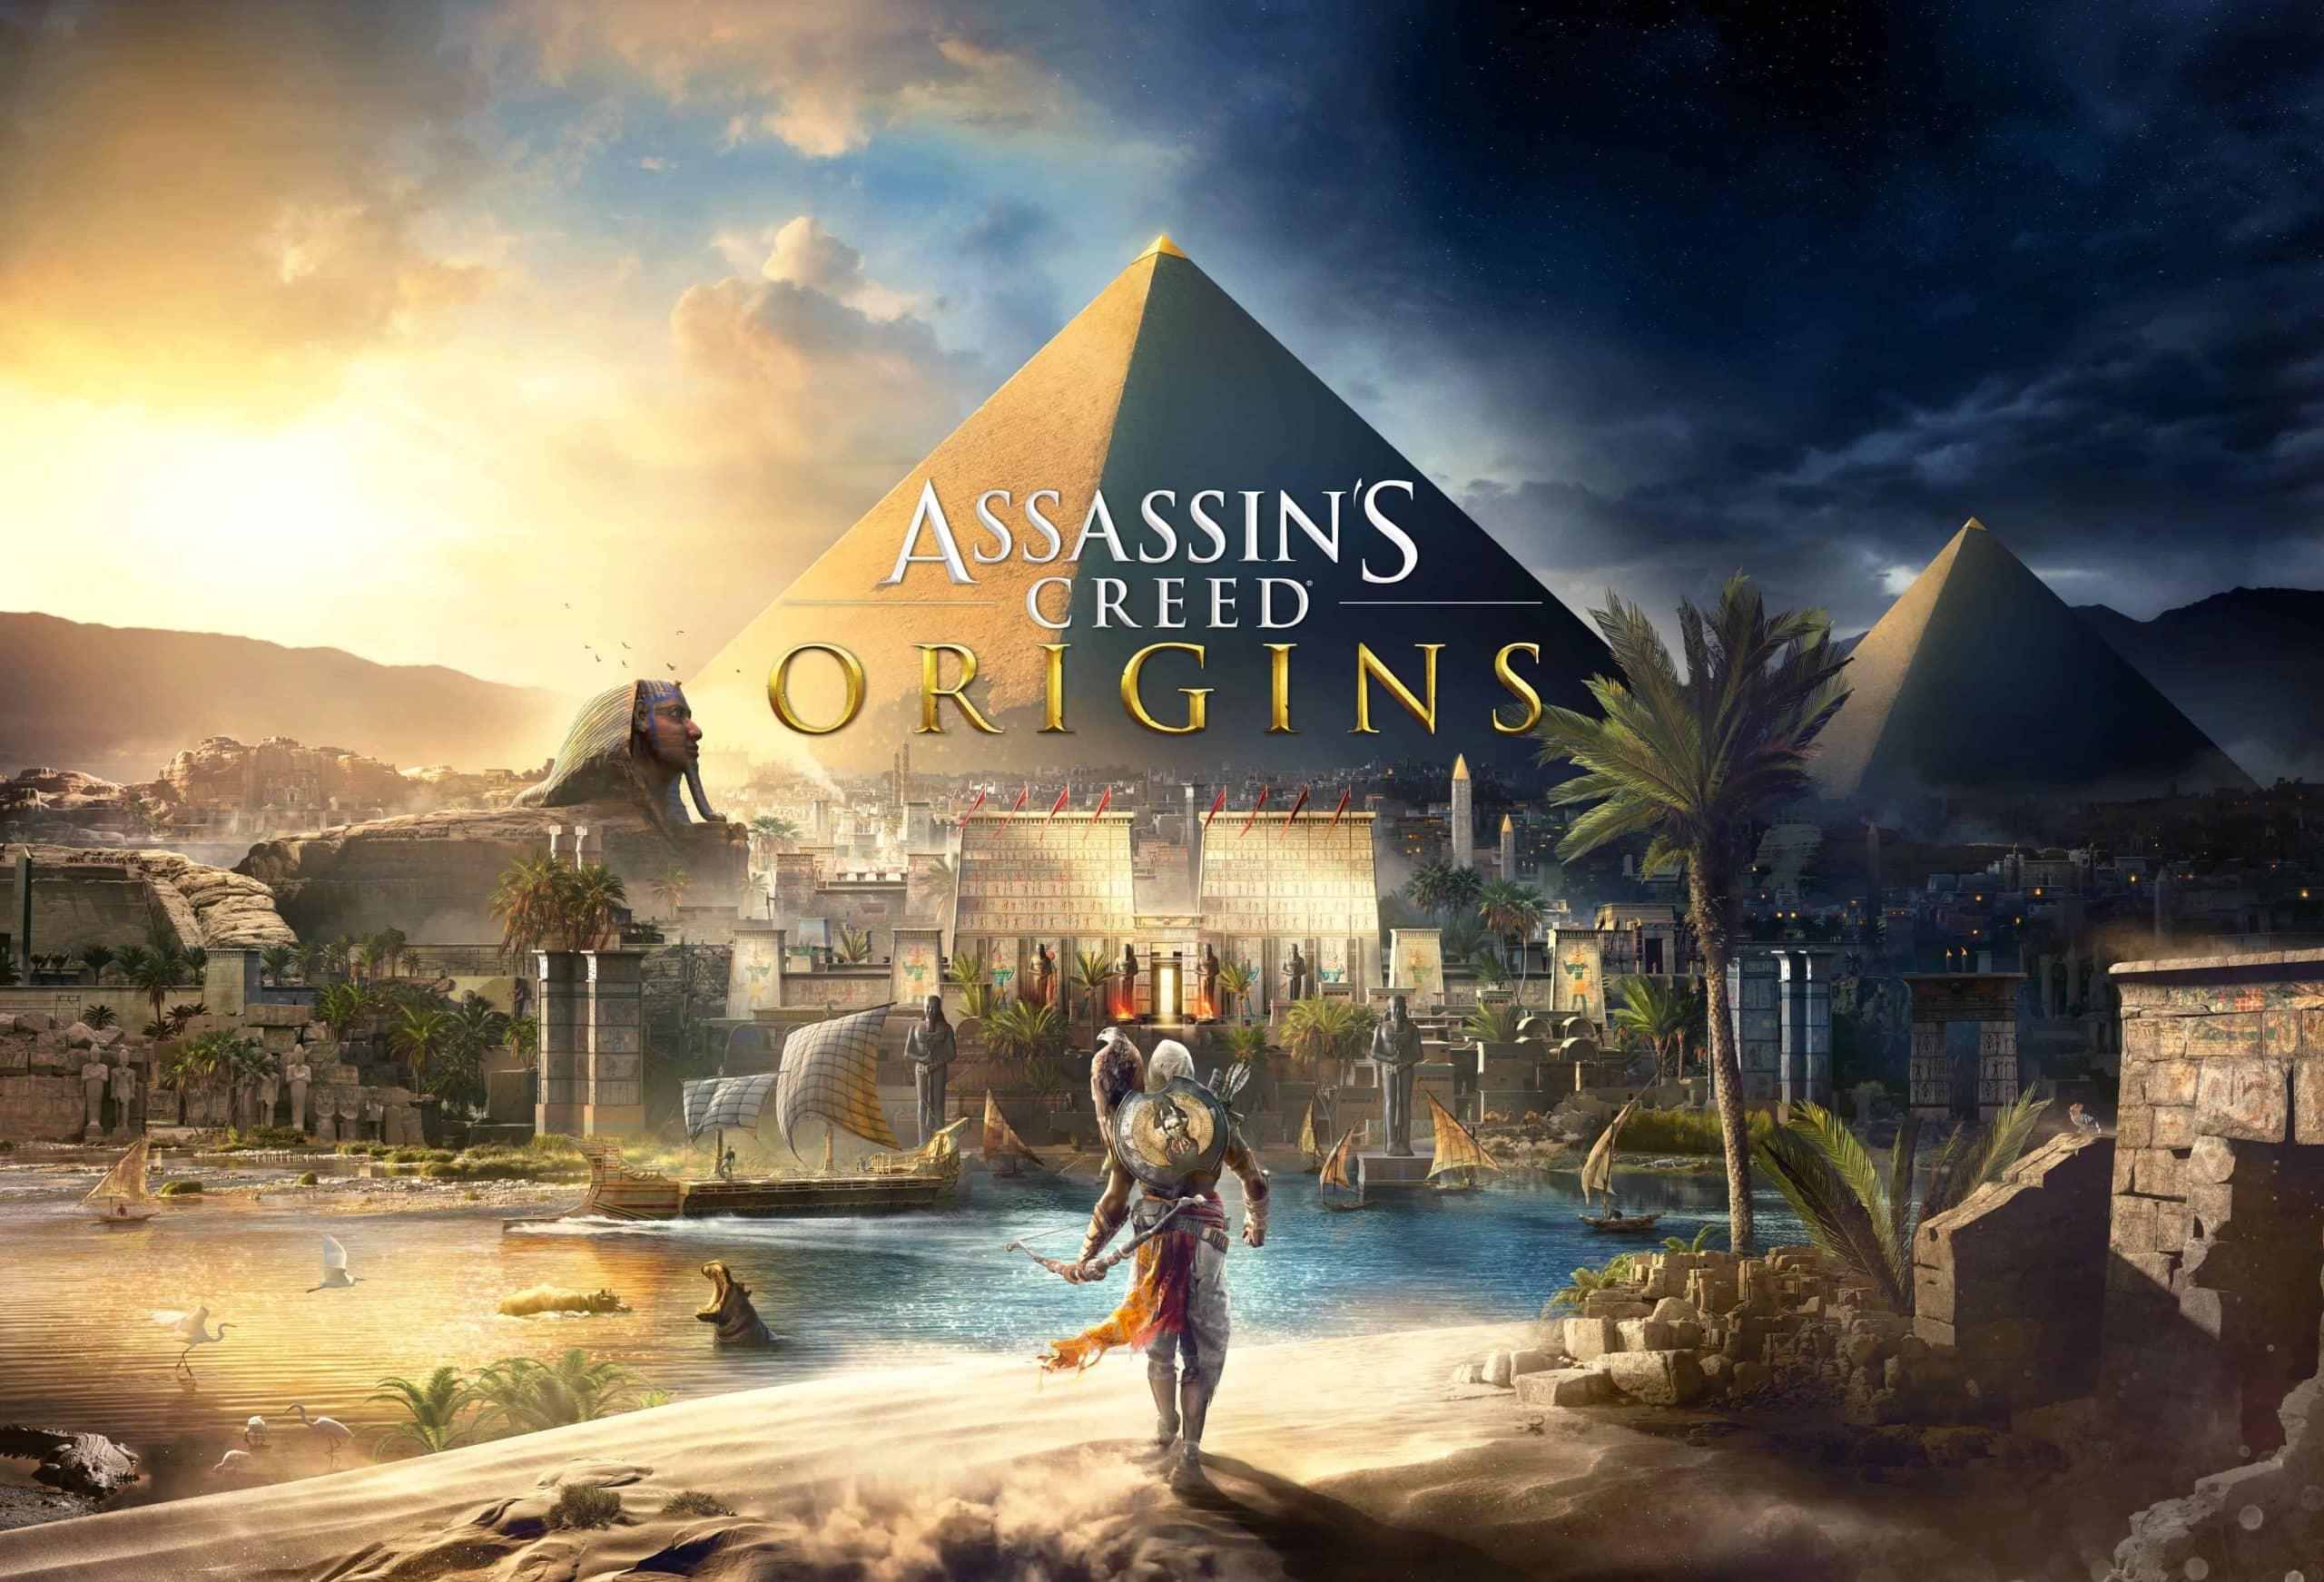 Assassin's Creed Origins herunterladen PC